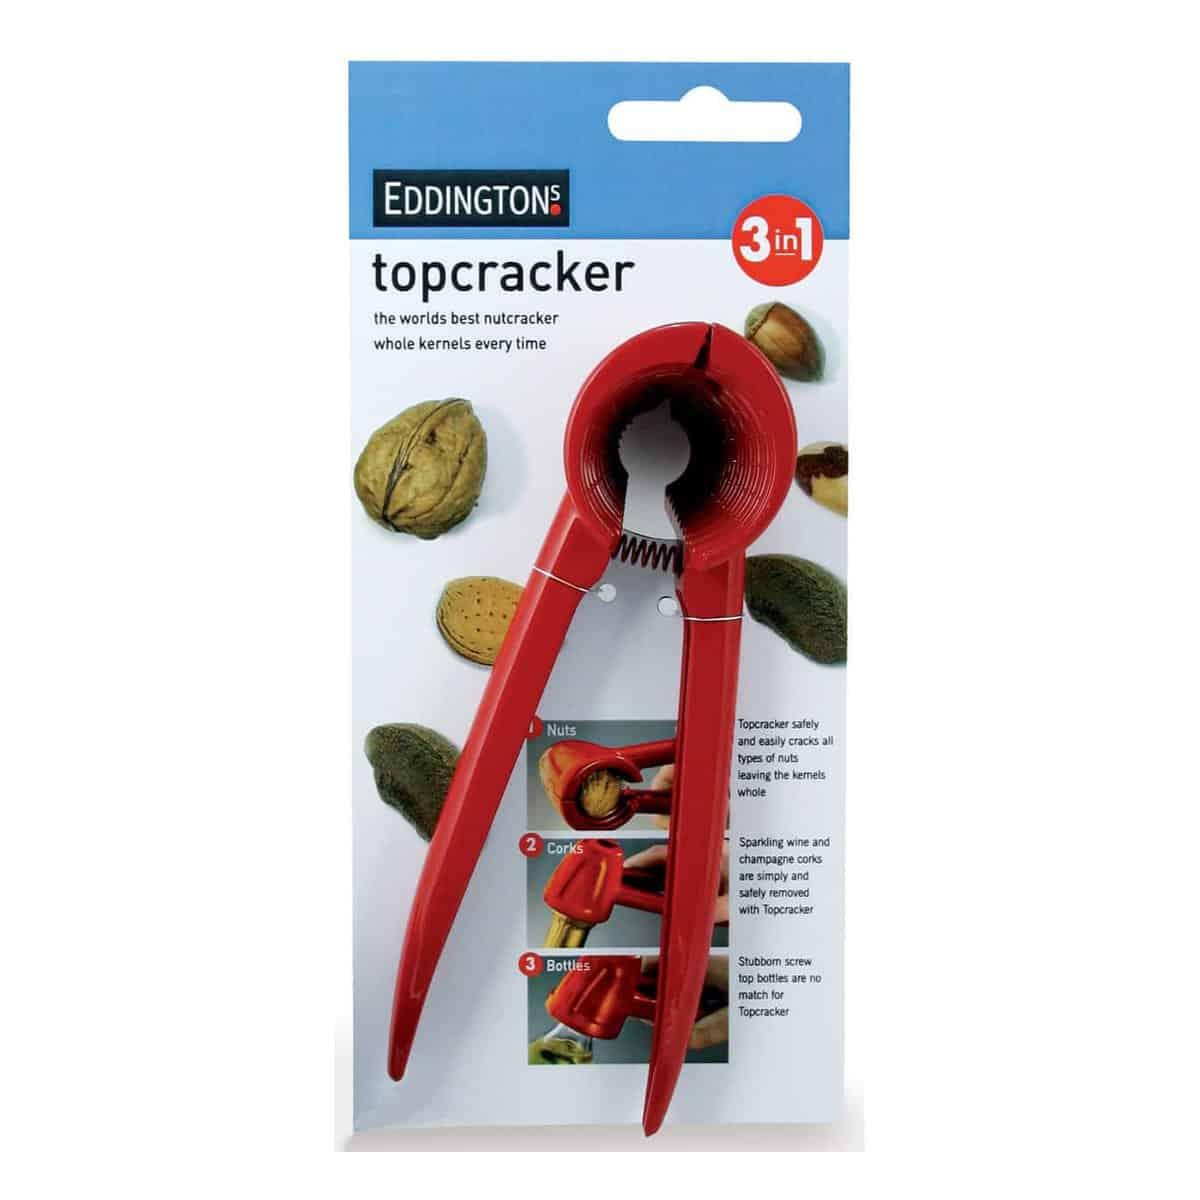 Eddingtons 3-in-1 Top Red Nut Cracker